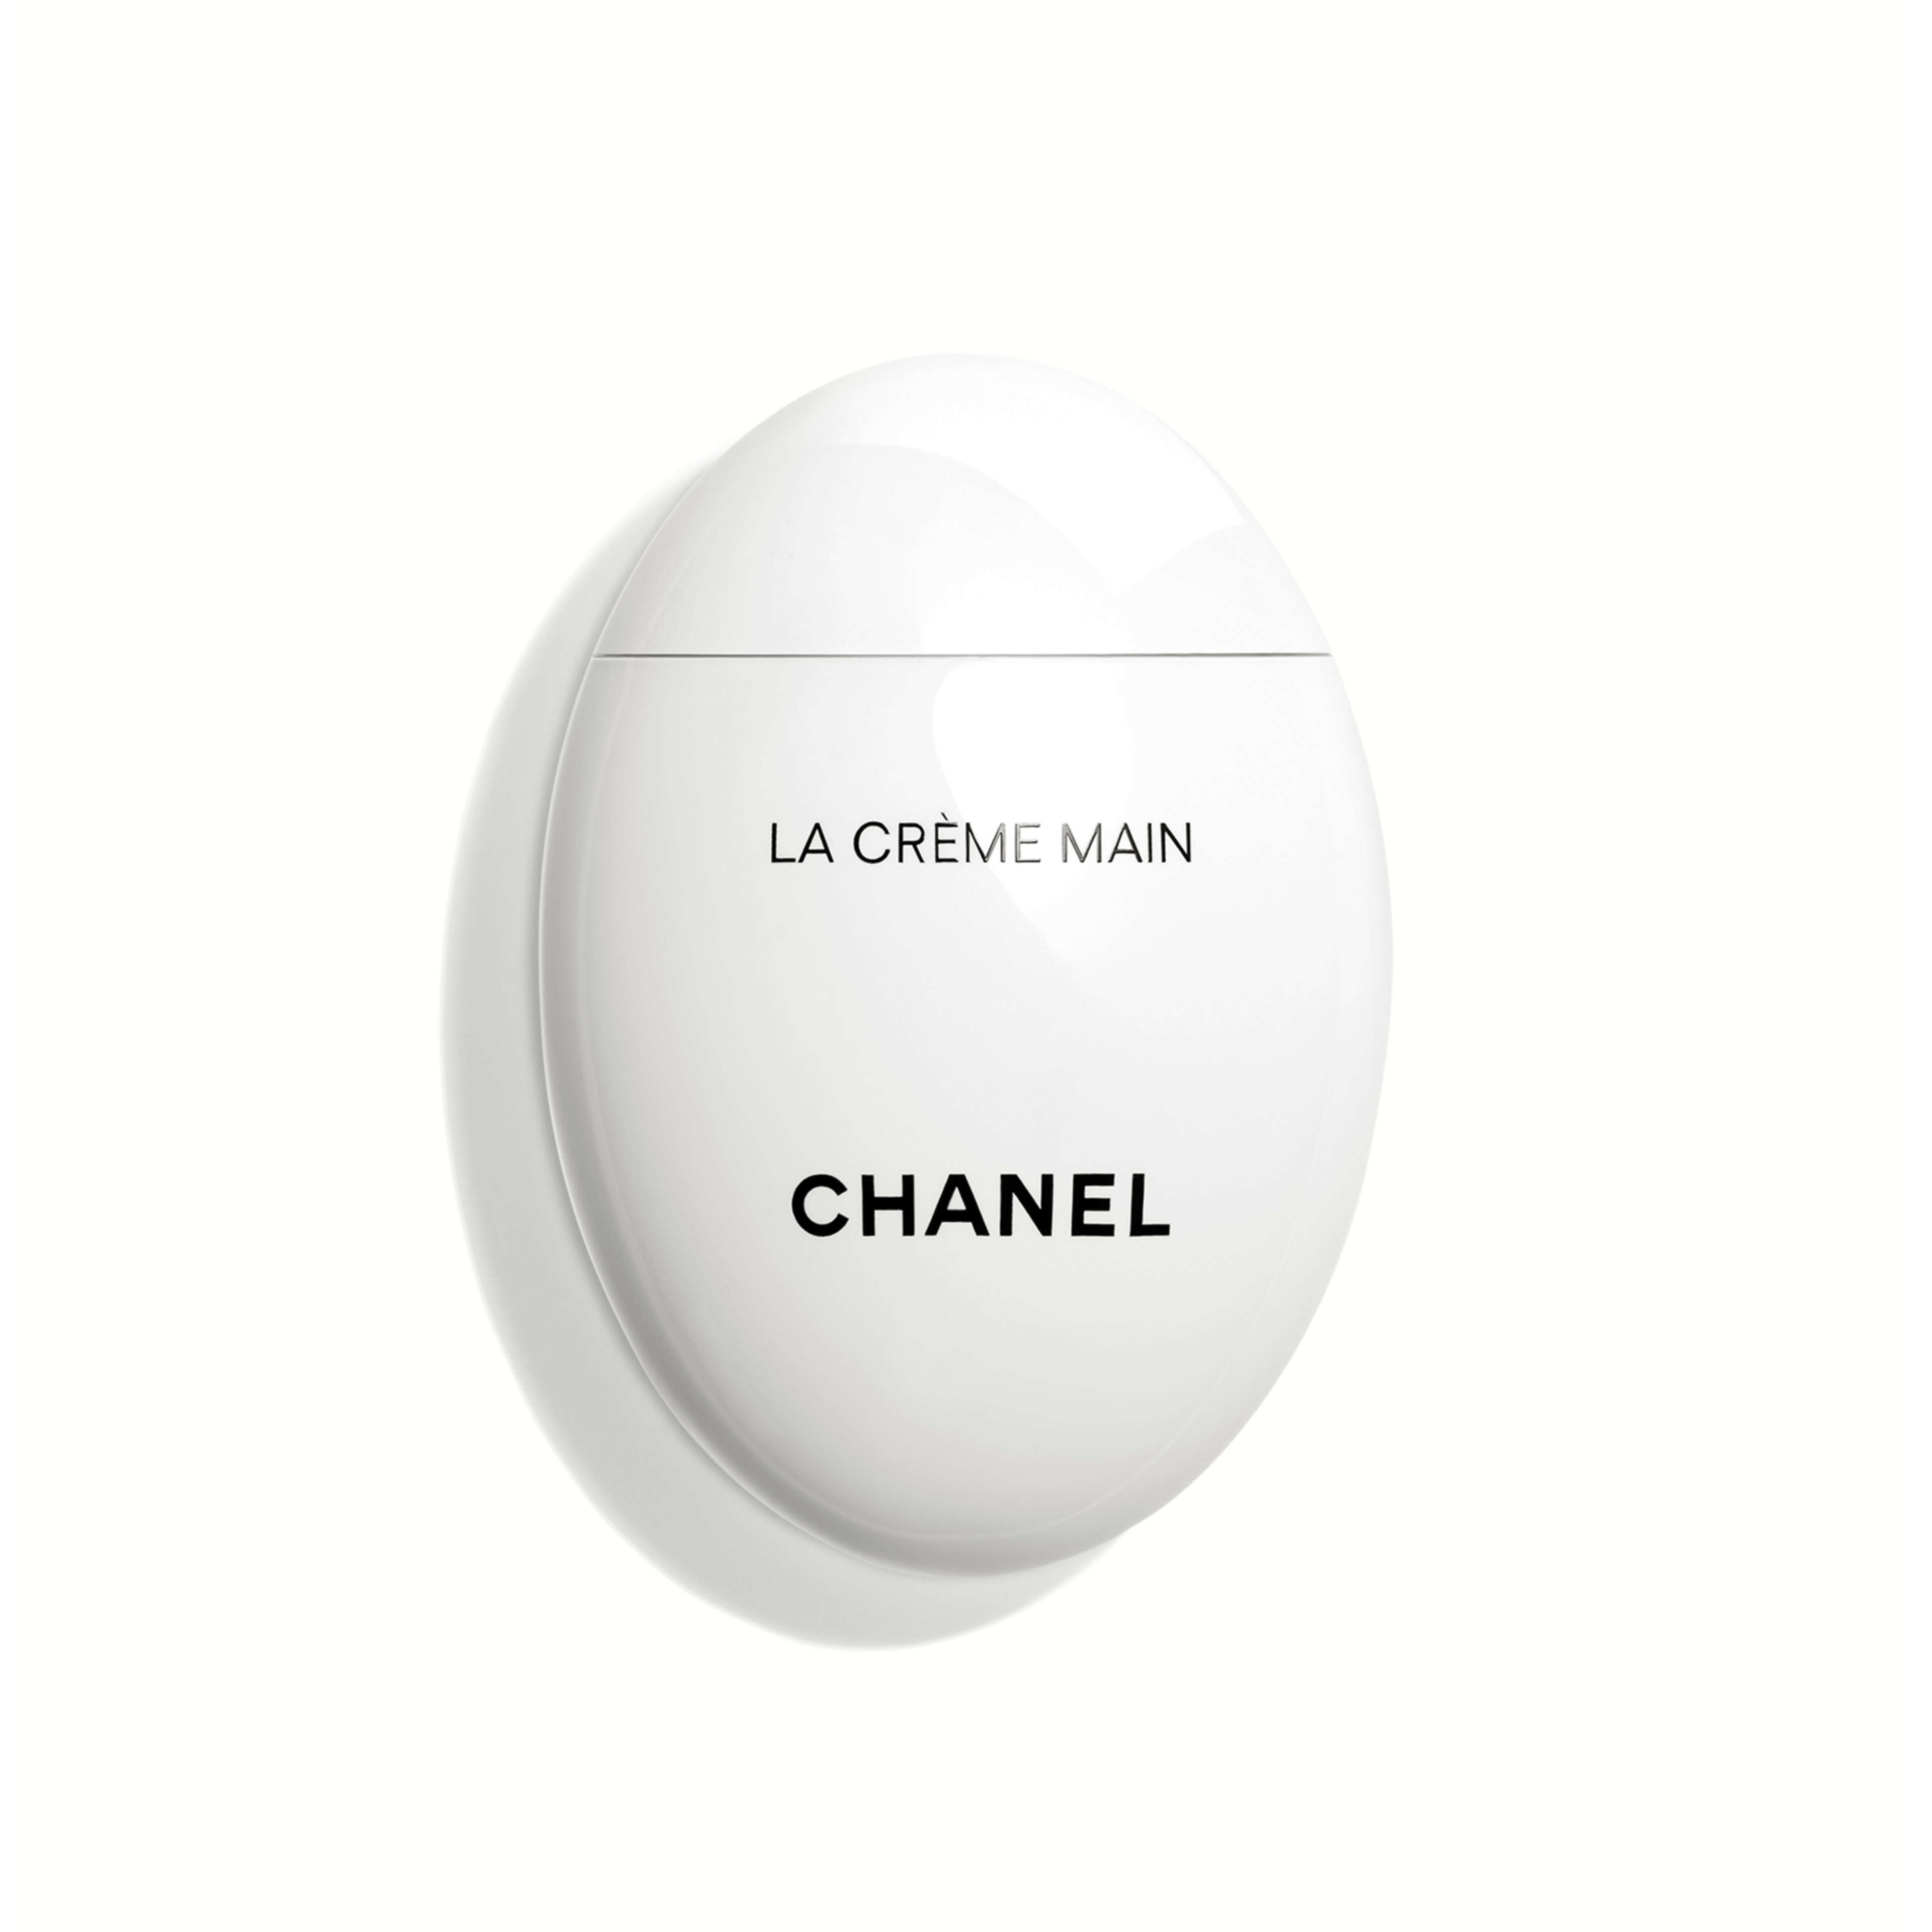 Chanel - La Creme Main